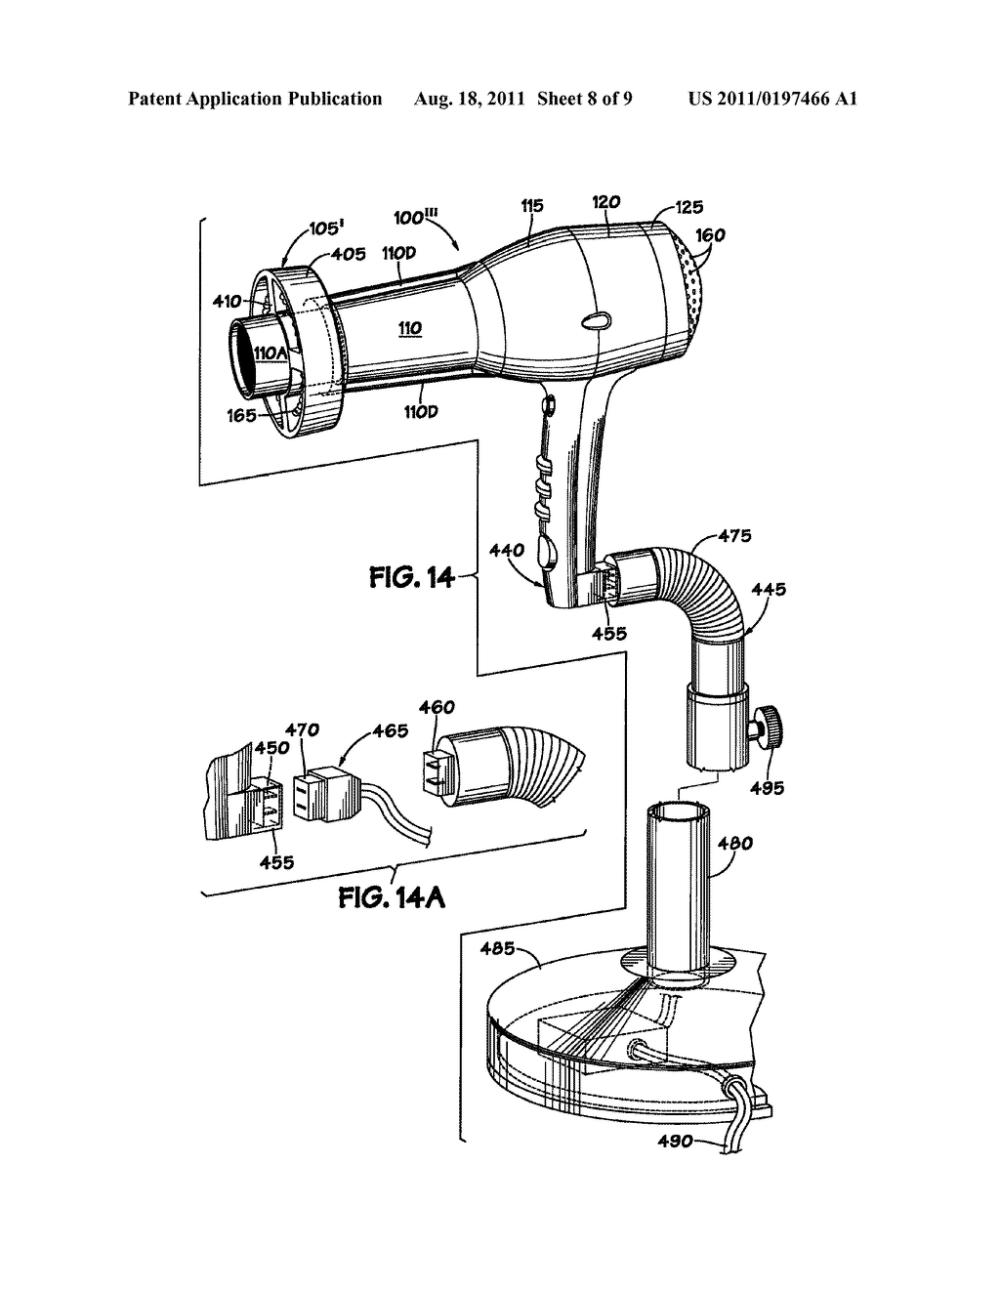 medium resolution of hair dryer diagram schematic and image 09 hair dryer repair ottawa hair dryer diagram